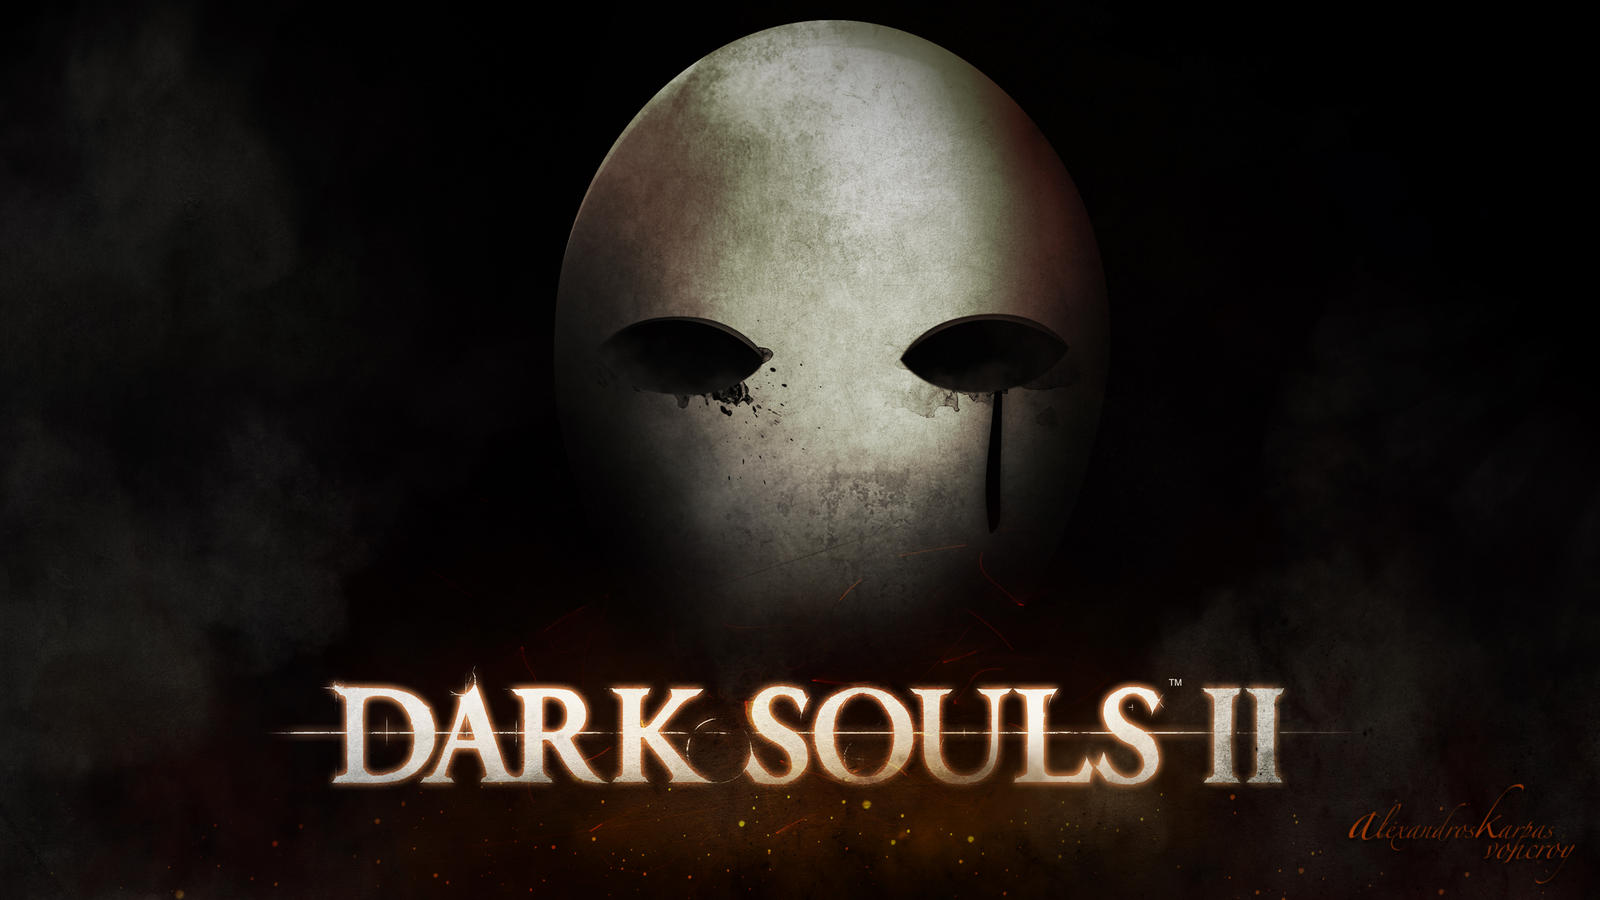 Dark Souls 2 - Mask by Voncroee